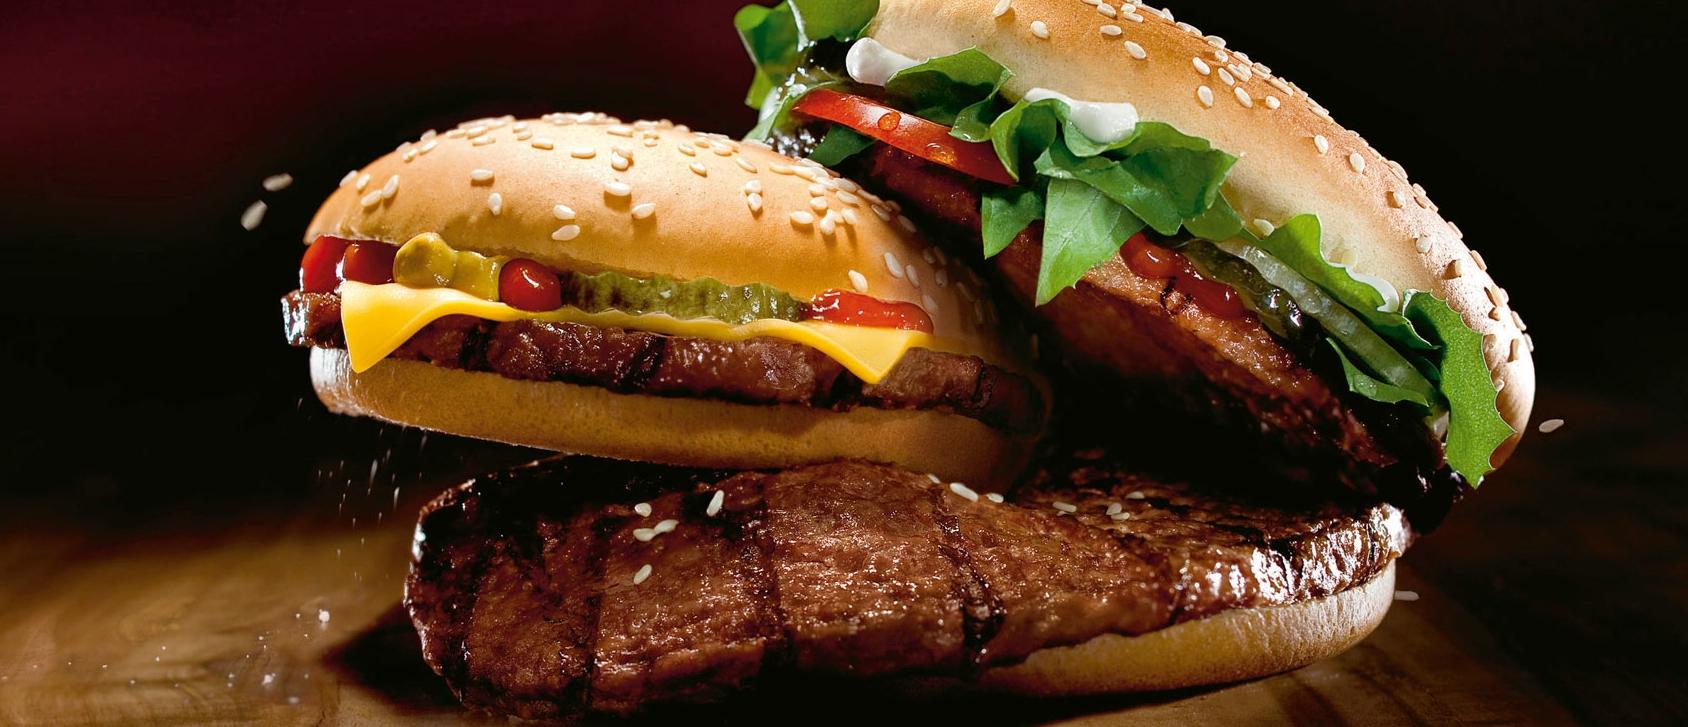 Burger King Halal Restaurant In Dubai Halal Trip